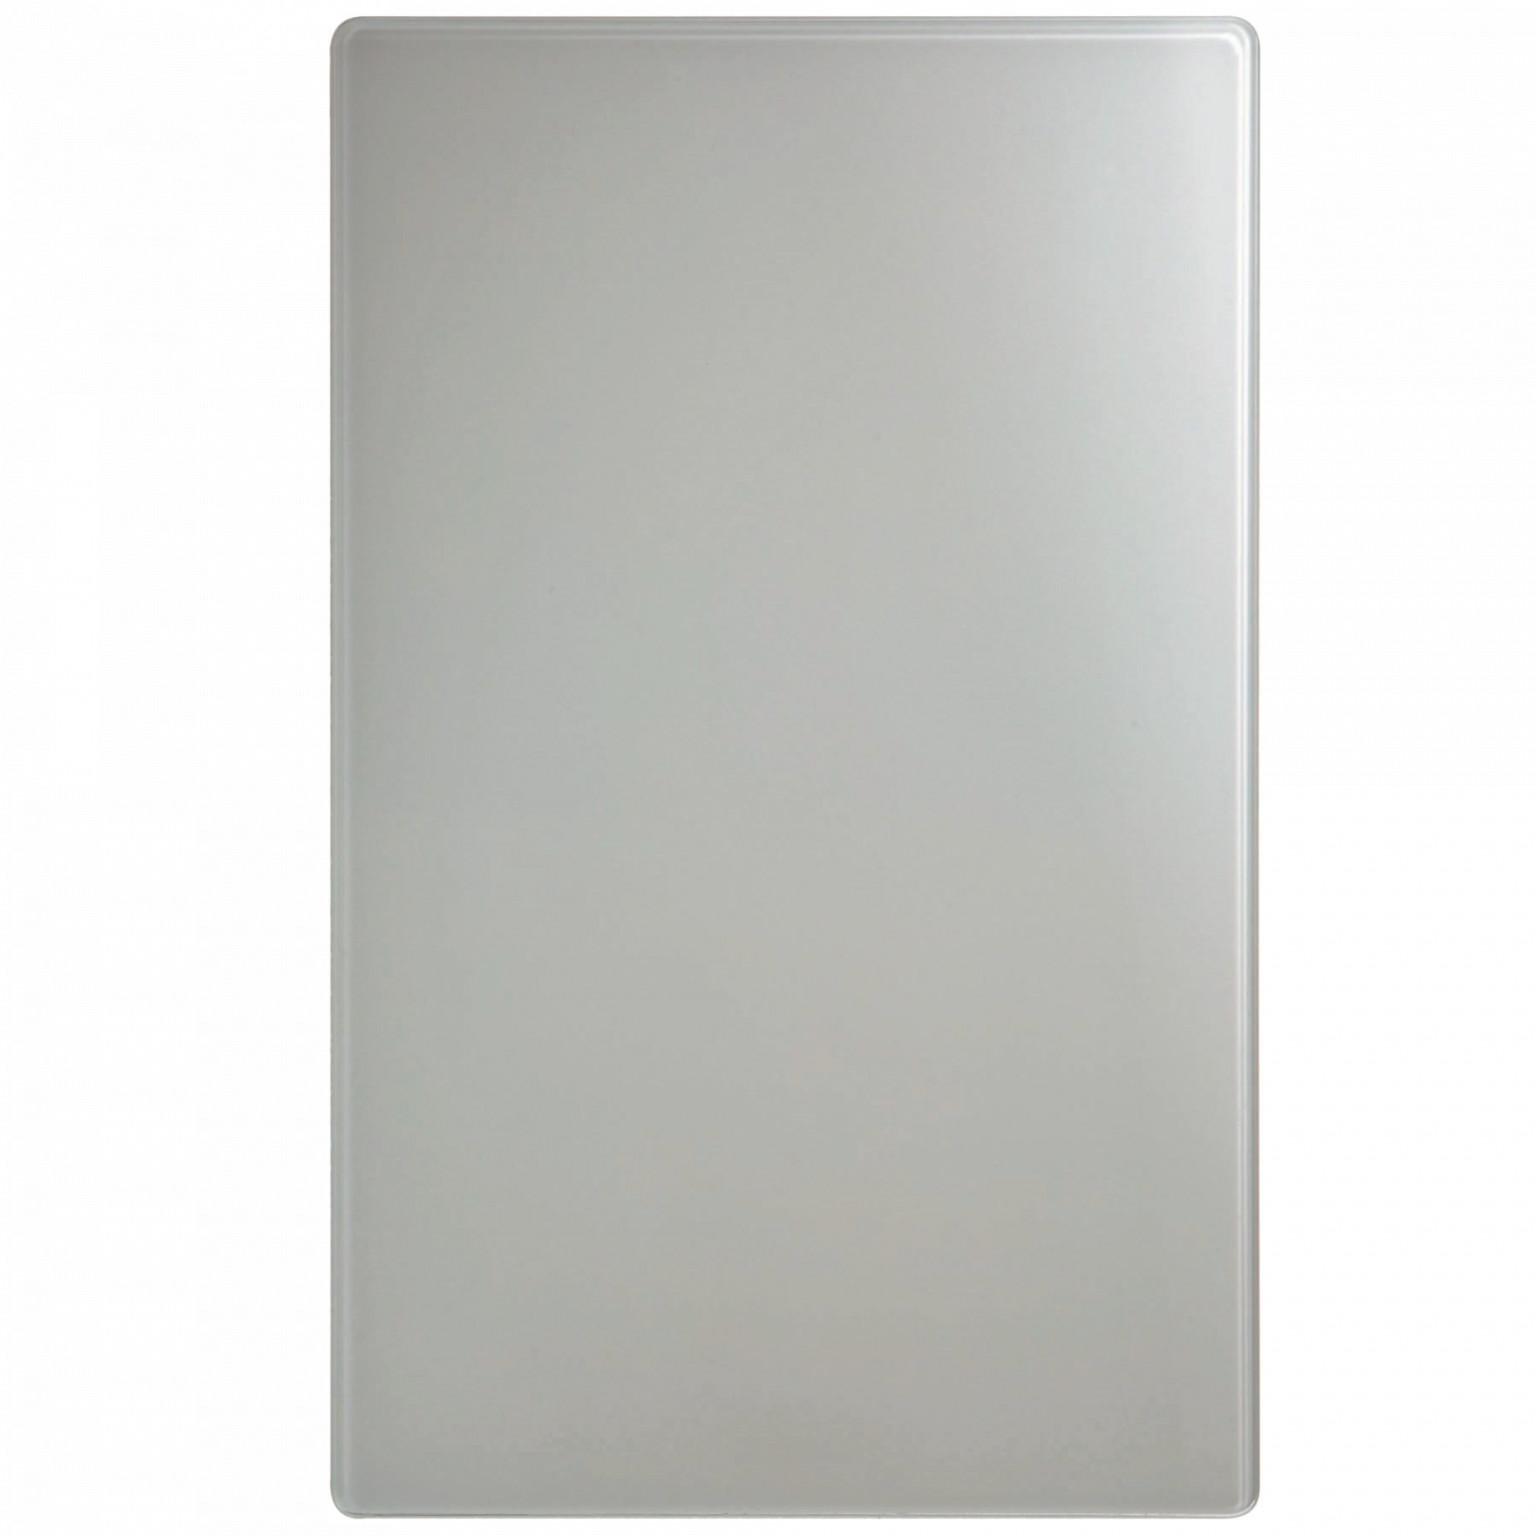 Thớt Cao Cấp - Cutting Board - CB02